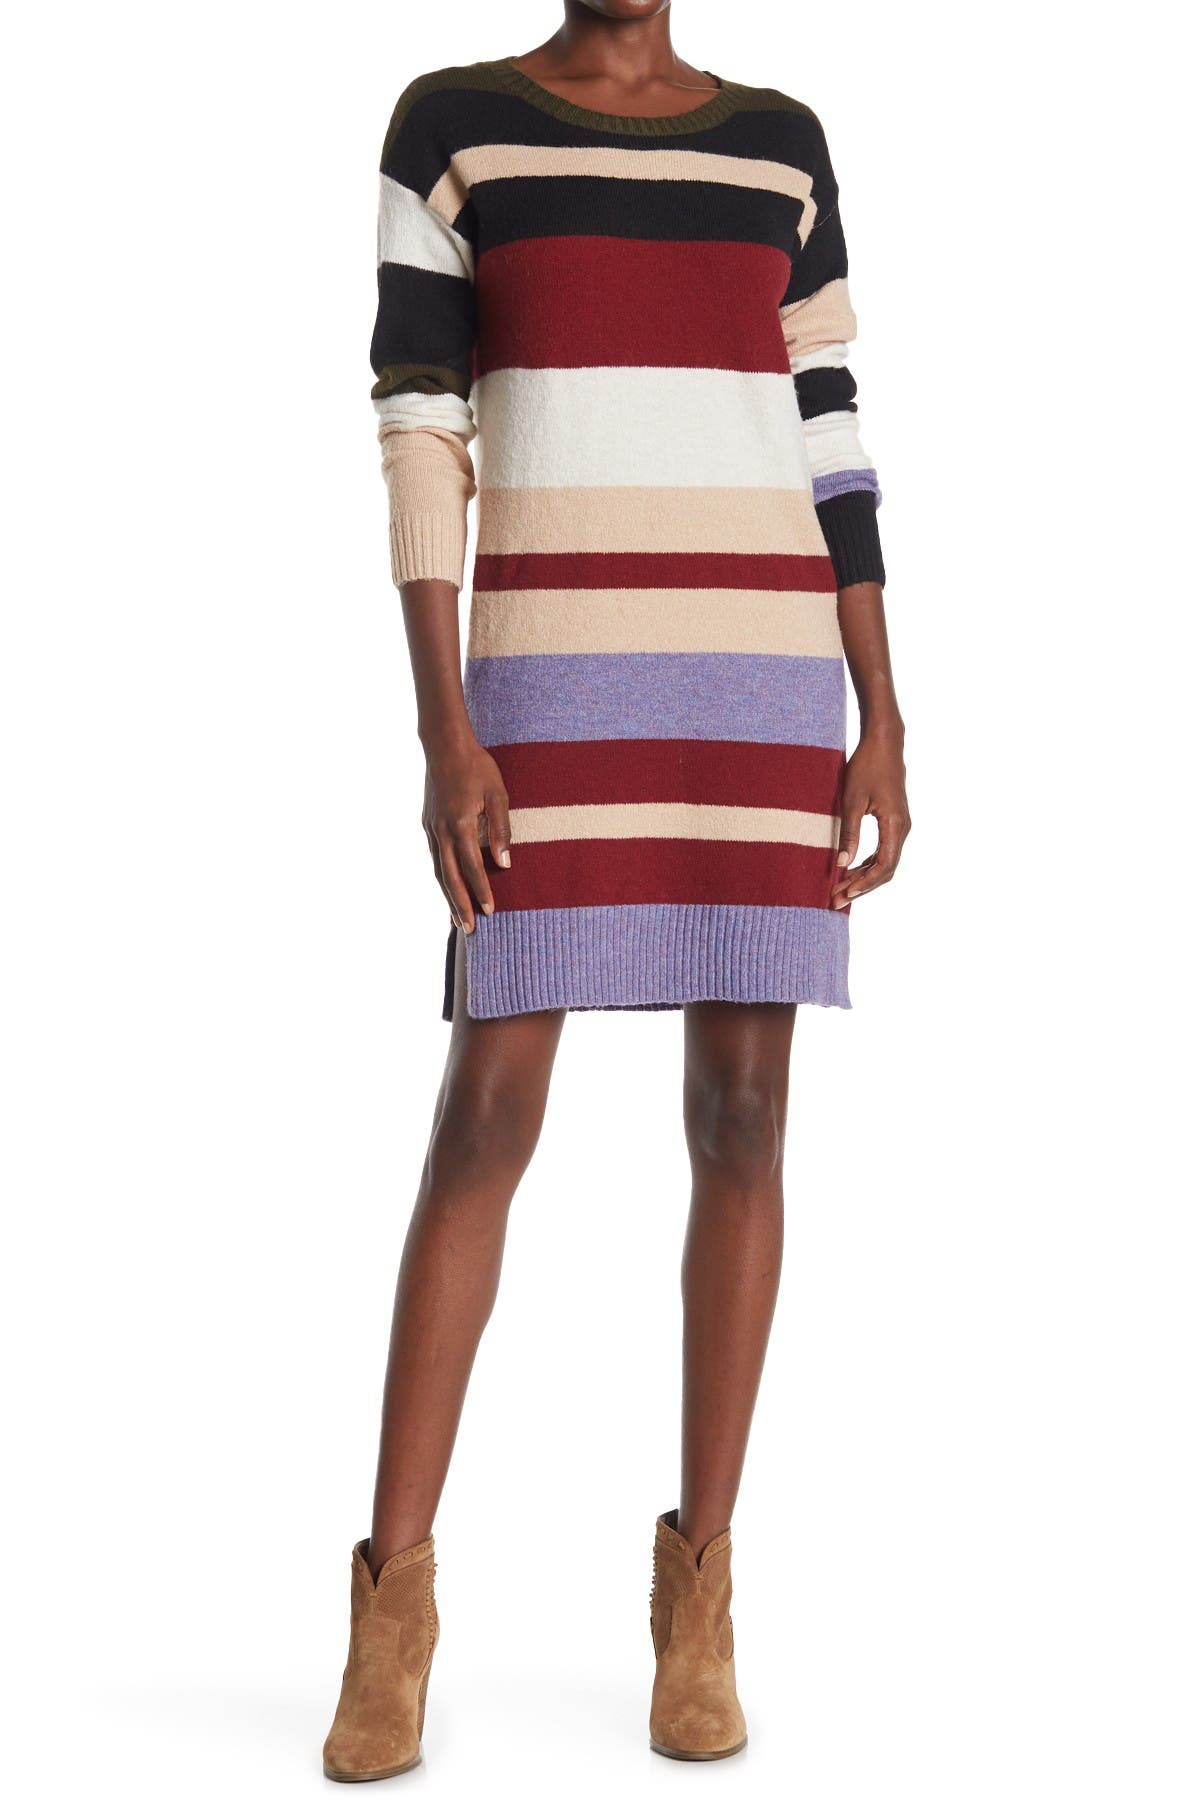 Image of STITCHDROP Harmonious Power Striped Dress